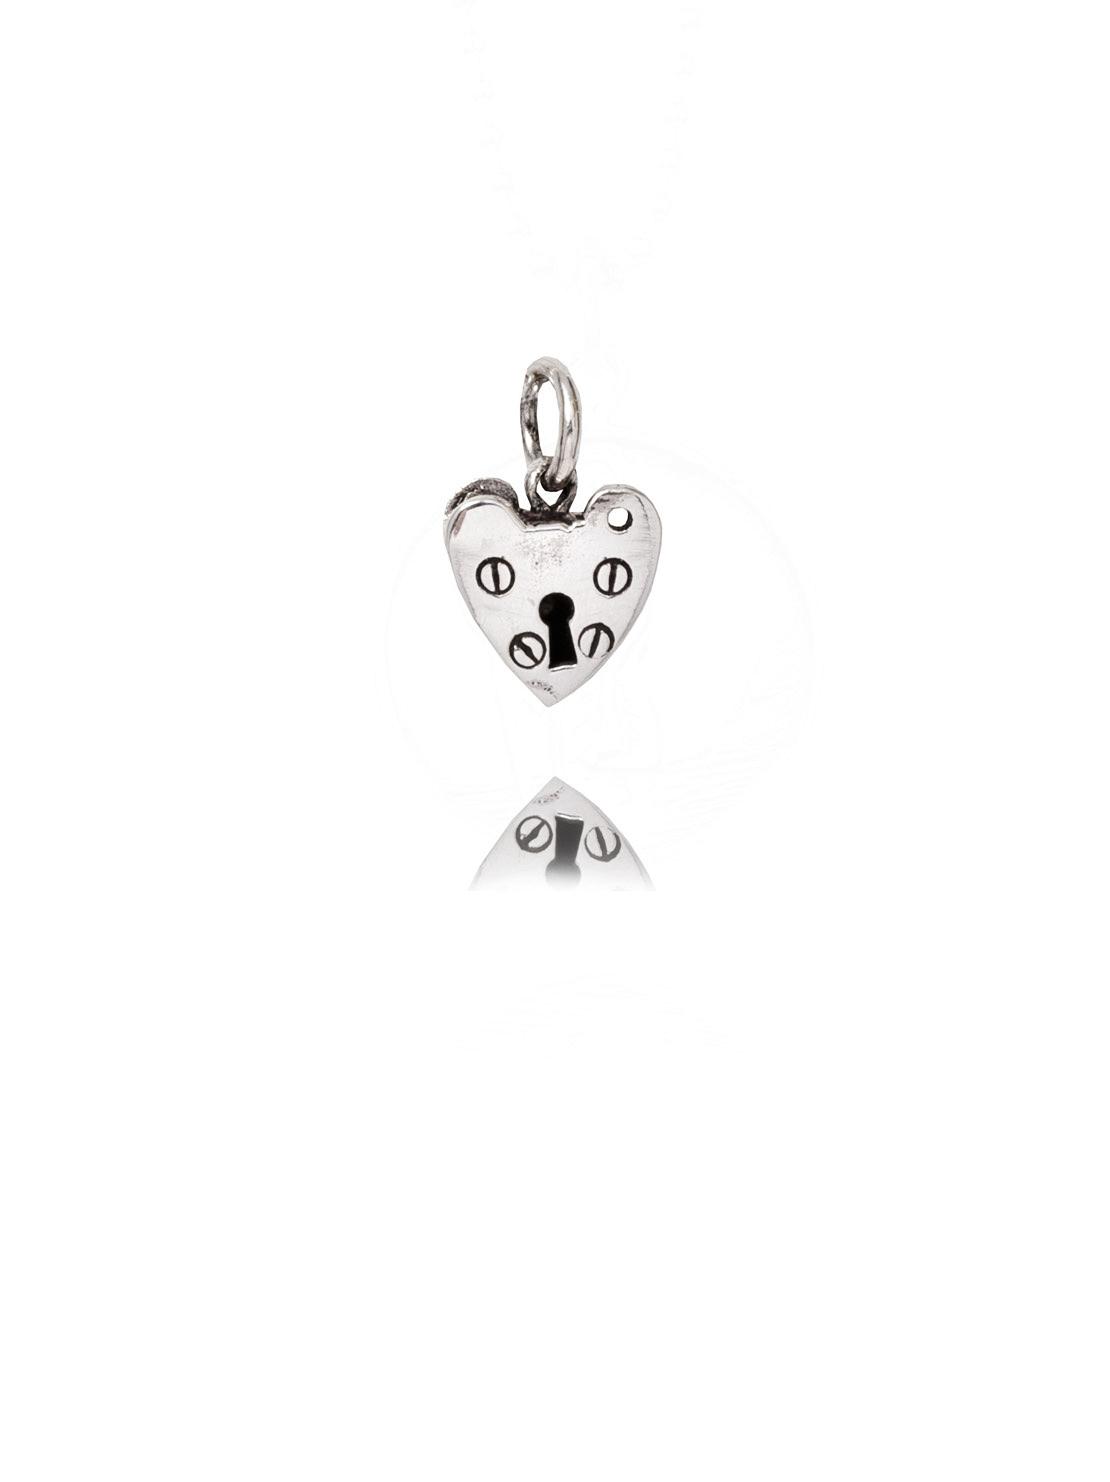 Silver Heart Padlock Charm